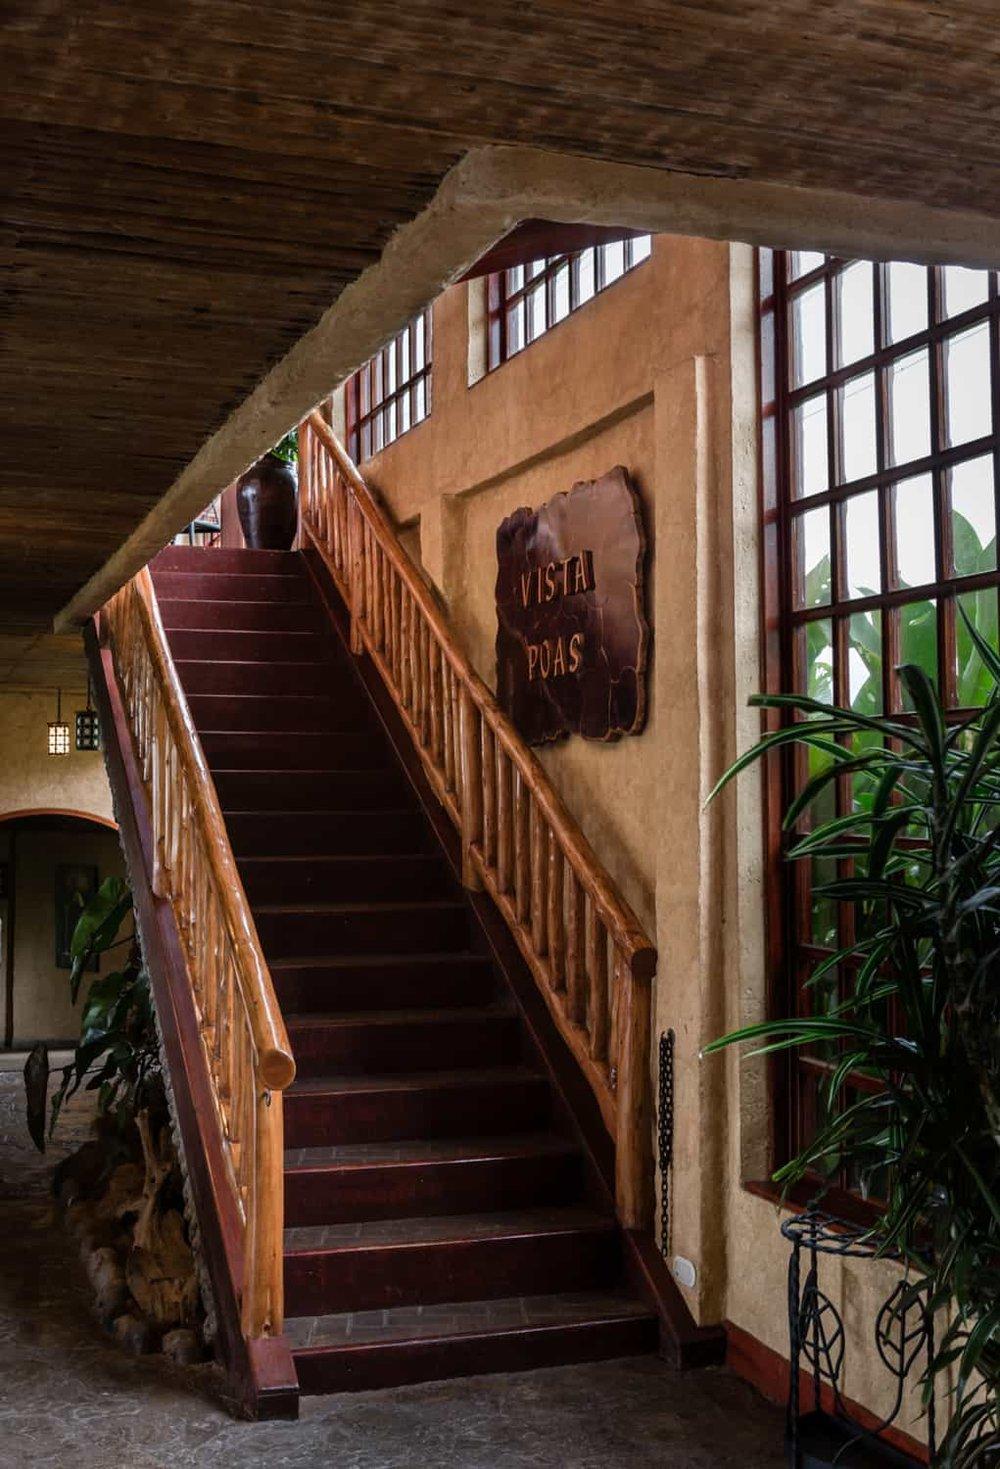 Entrance to La Paz Waterfall Gardens' Vista Poas Restaurant.